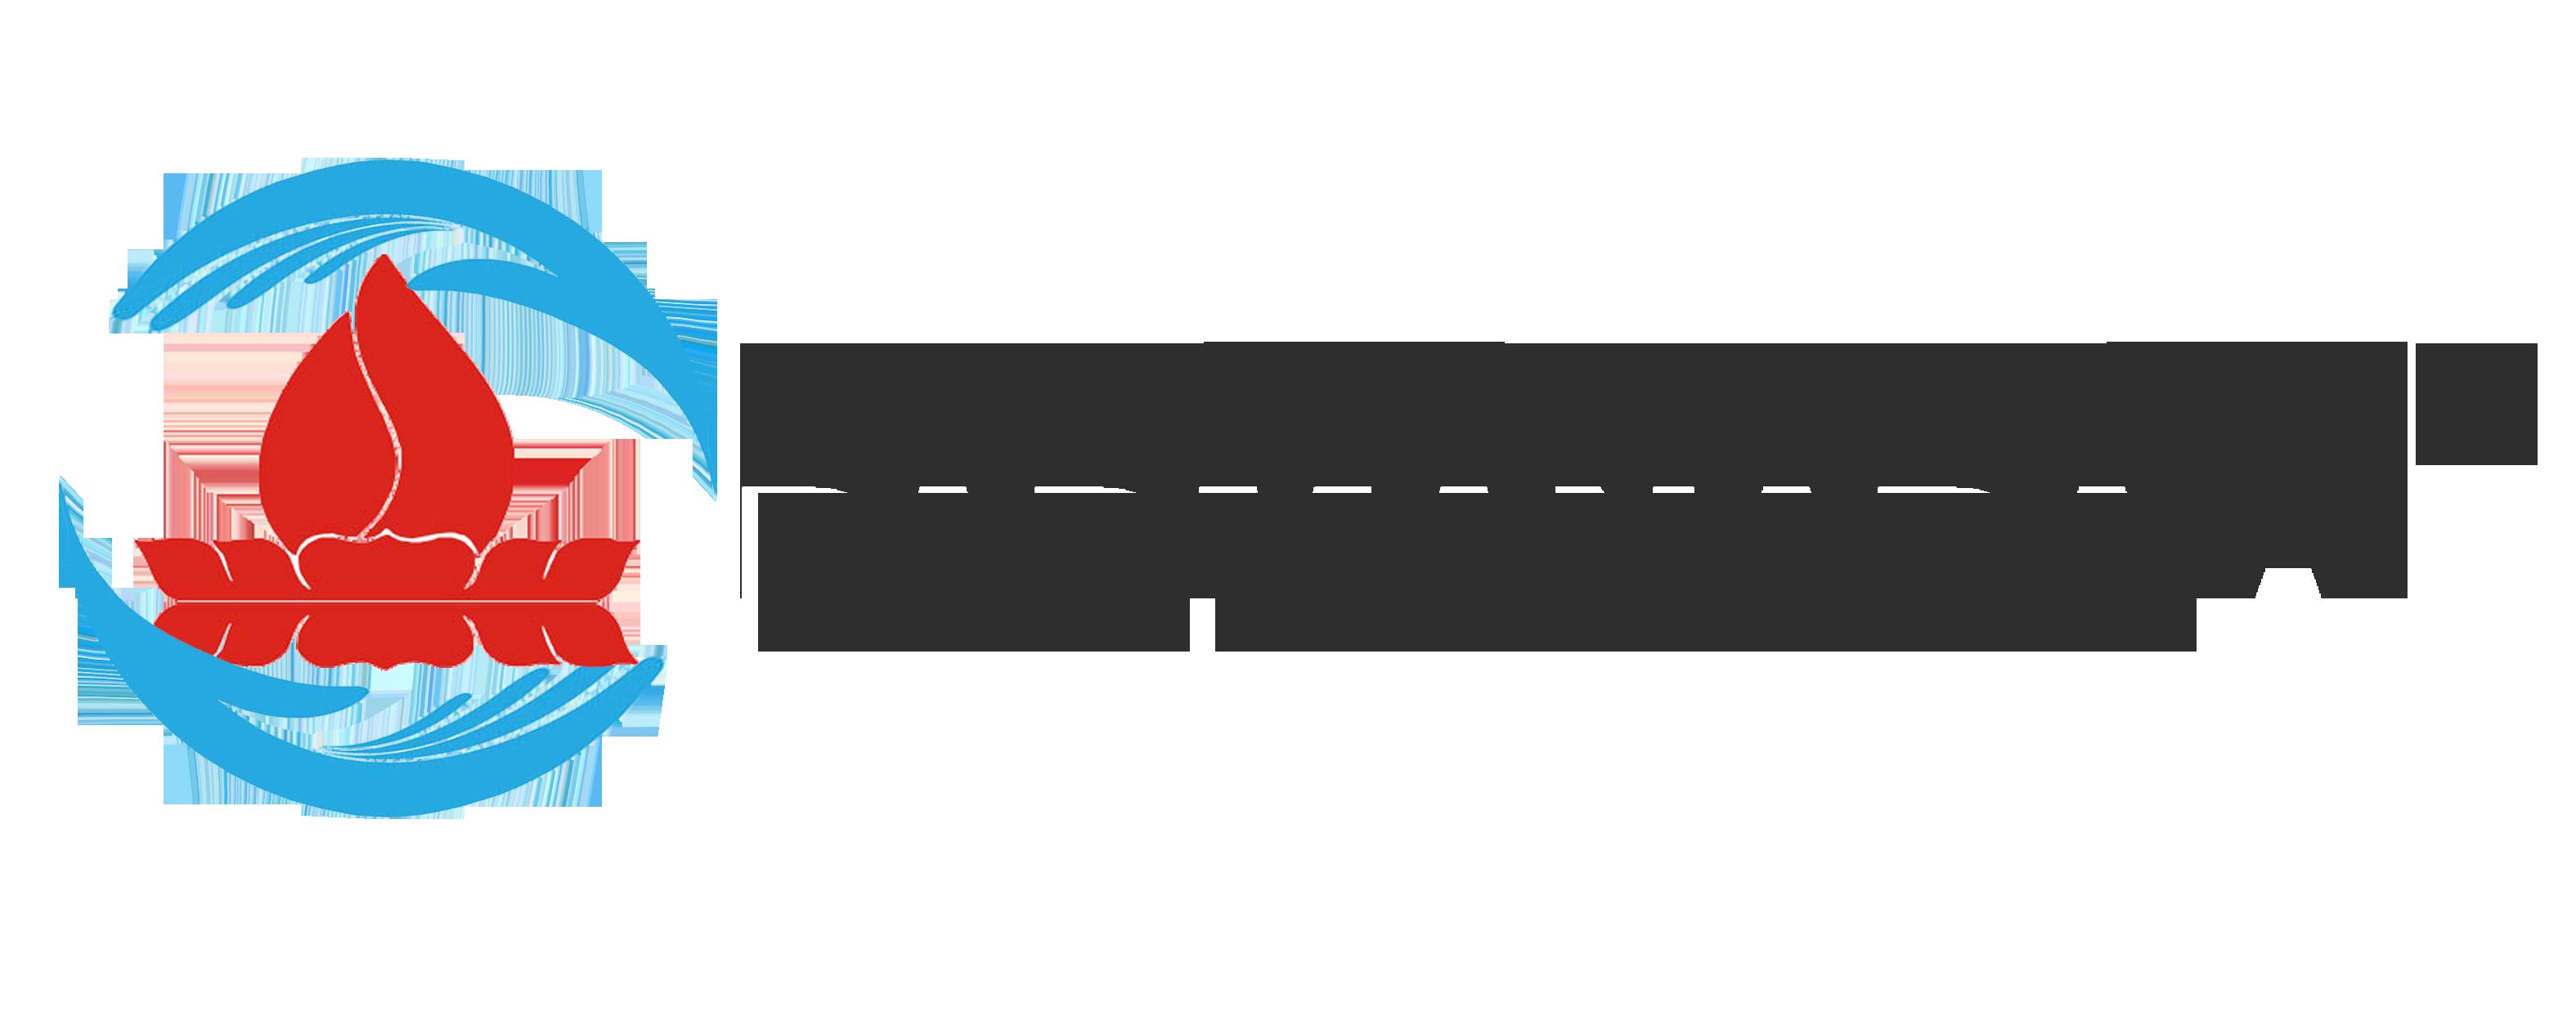 Padmanaba